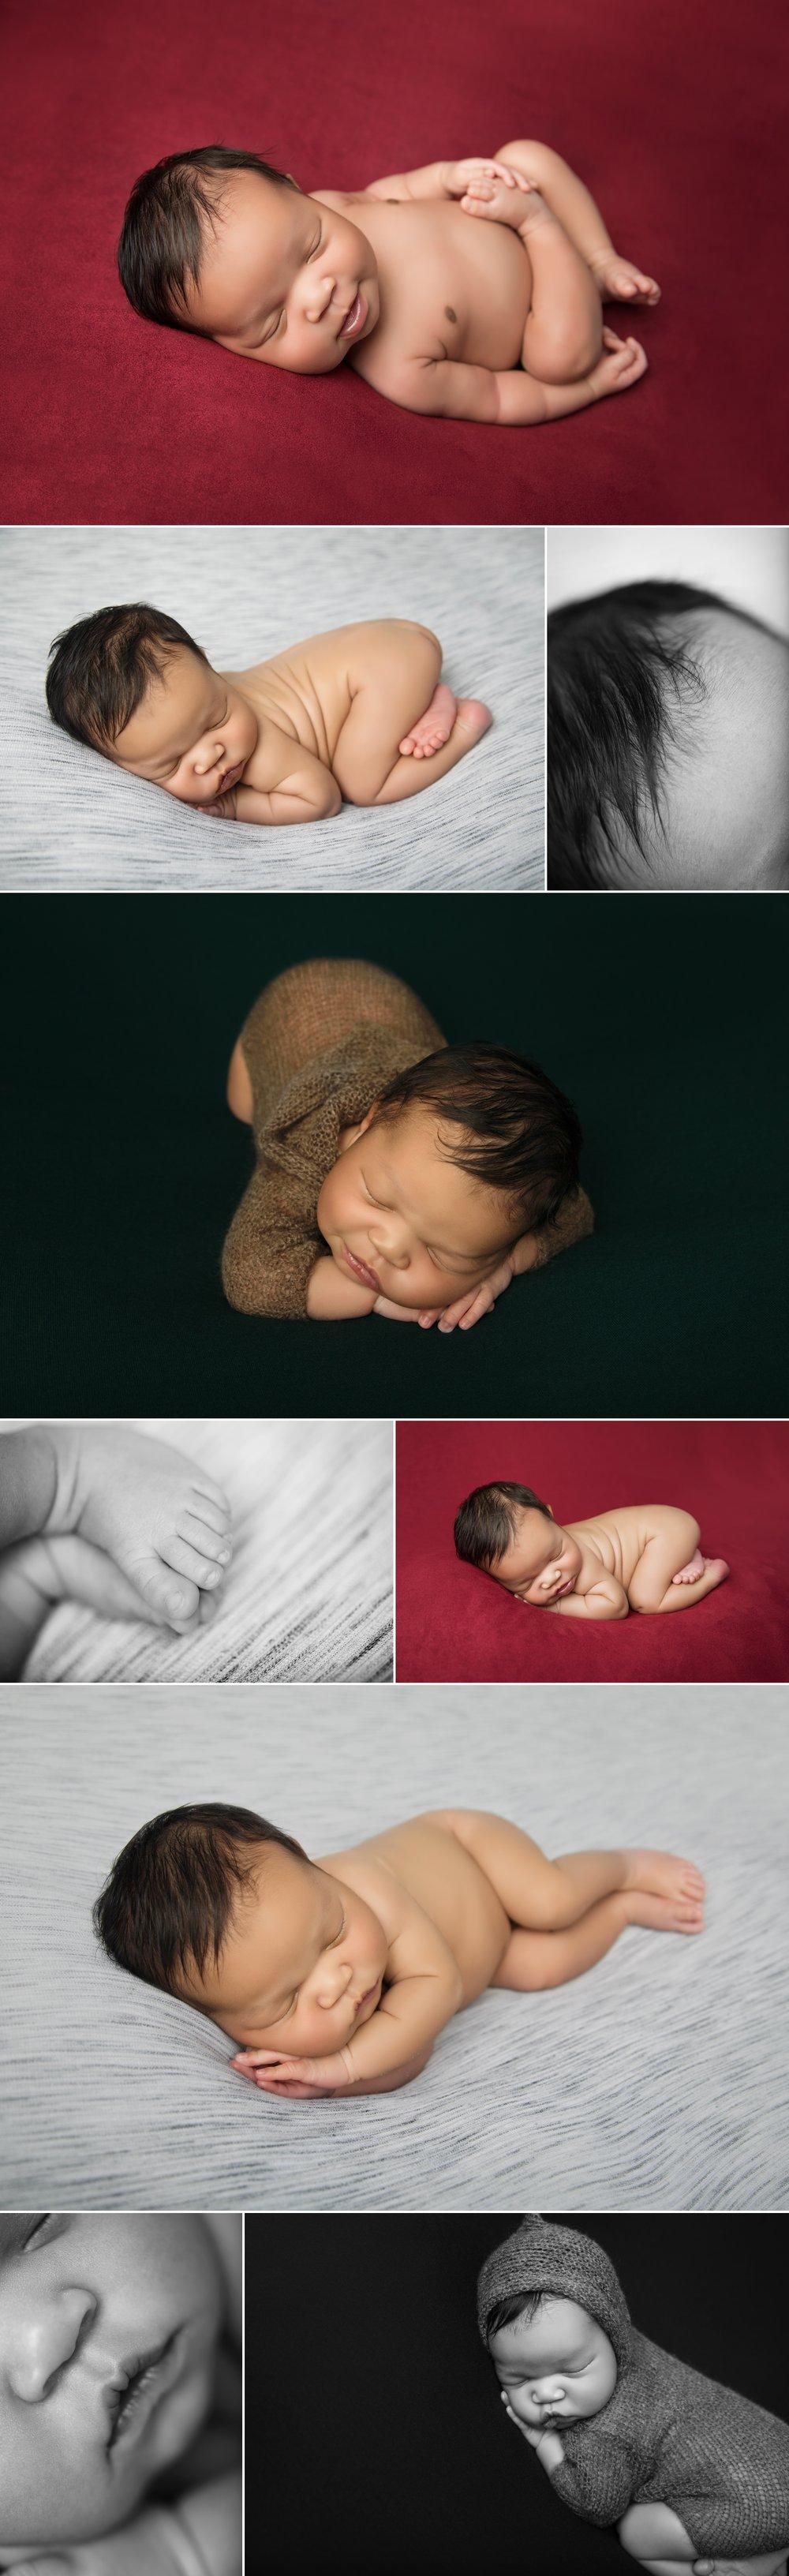 Noah Collage 1.jpg